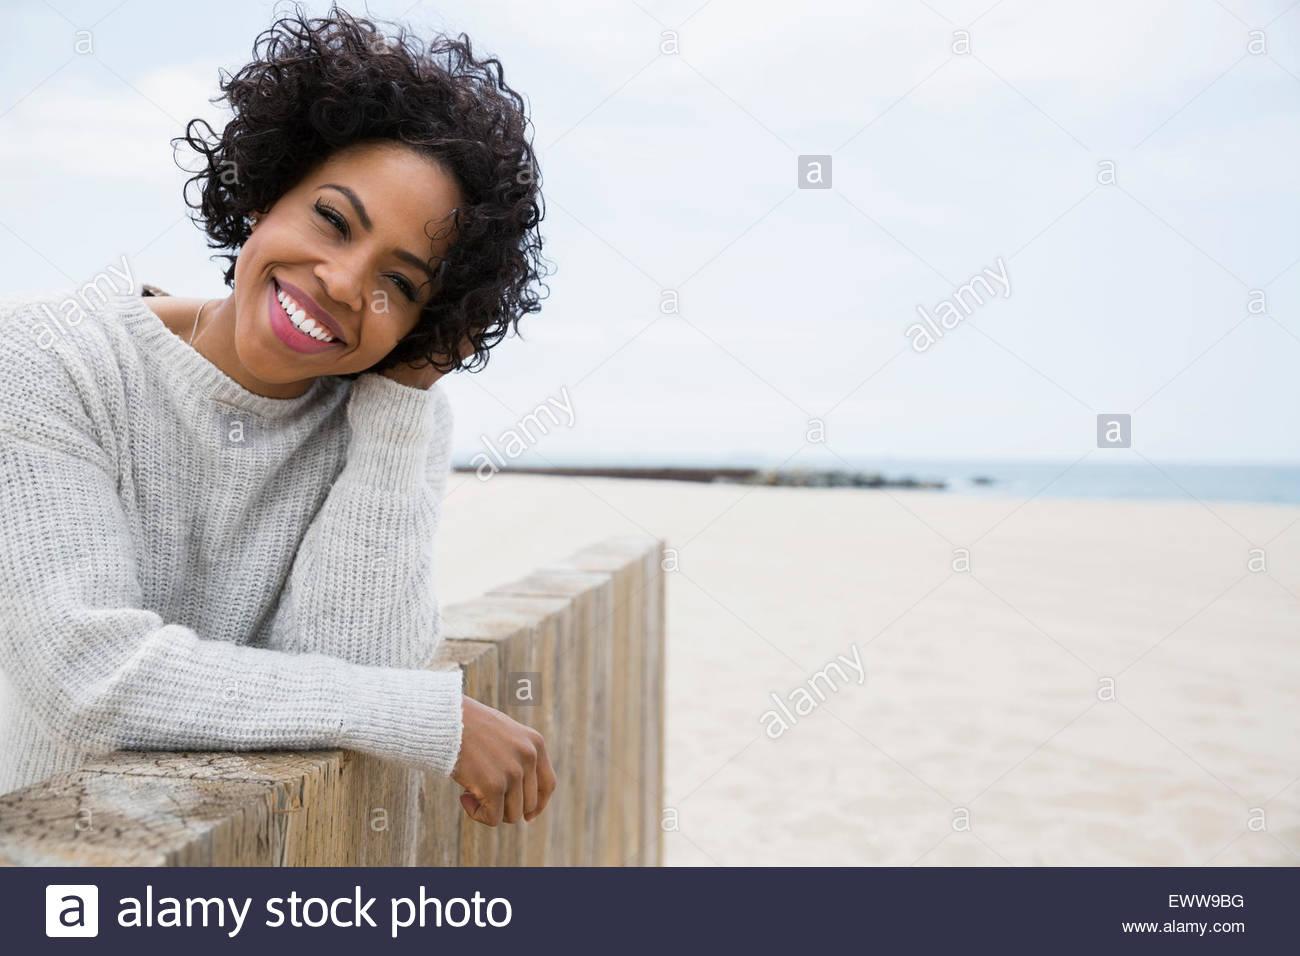 Porträt Frau lockiges schwarzes Haar Strand Wand Lächeln Stockbild